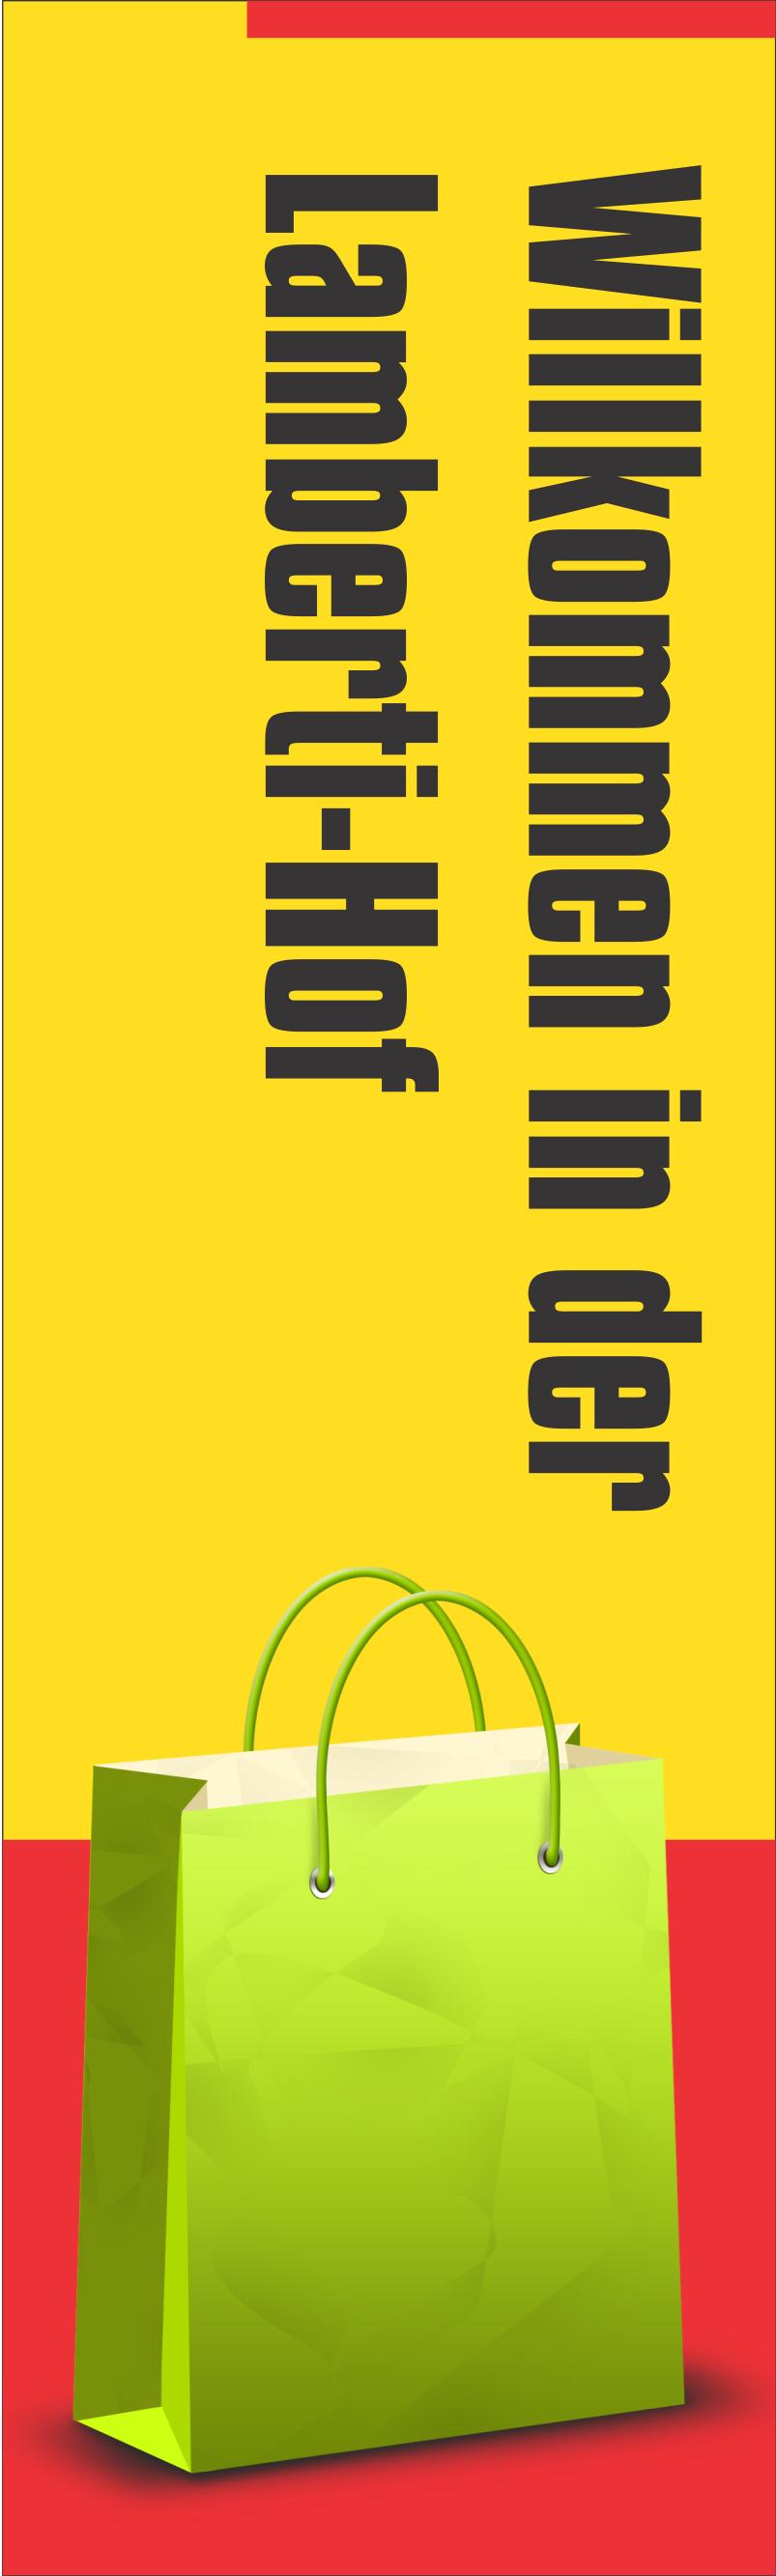 Sima banner10